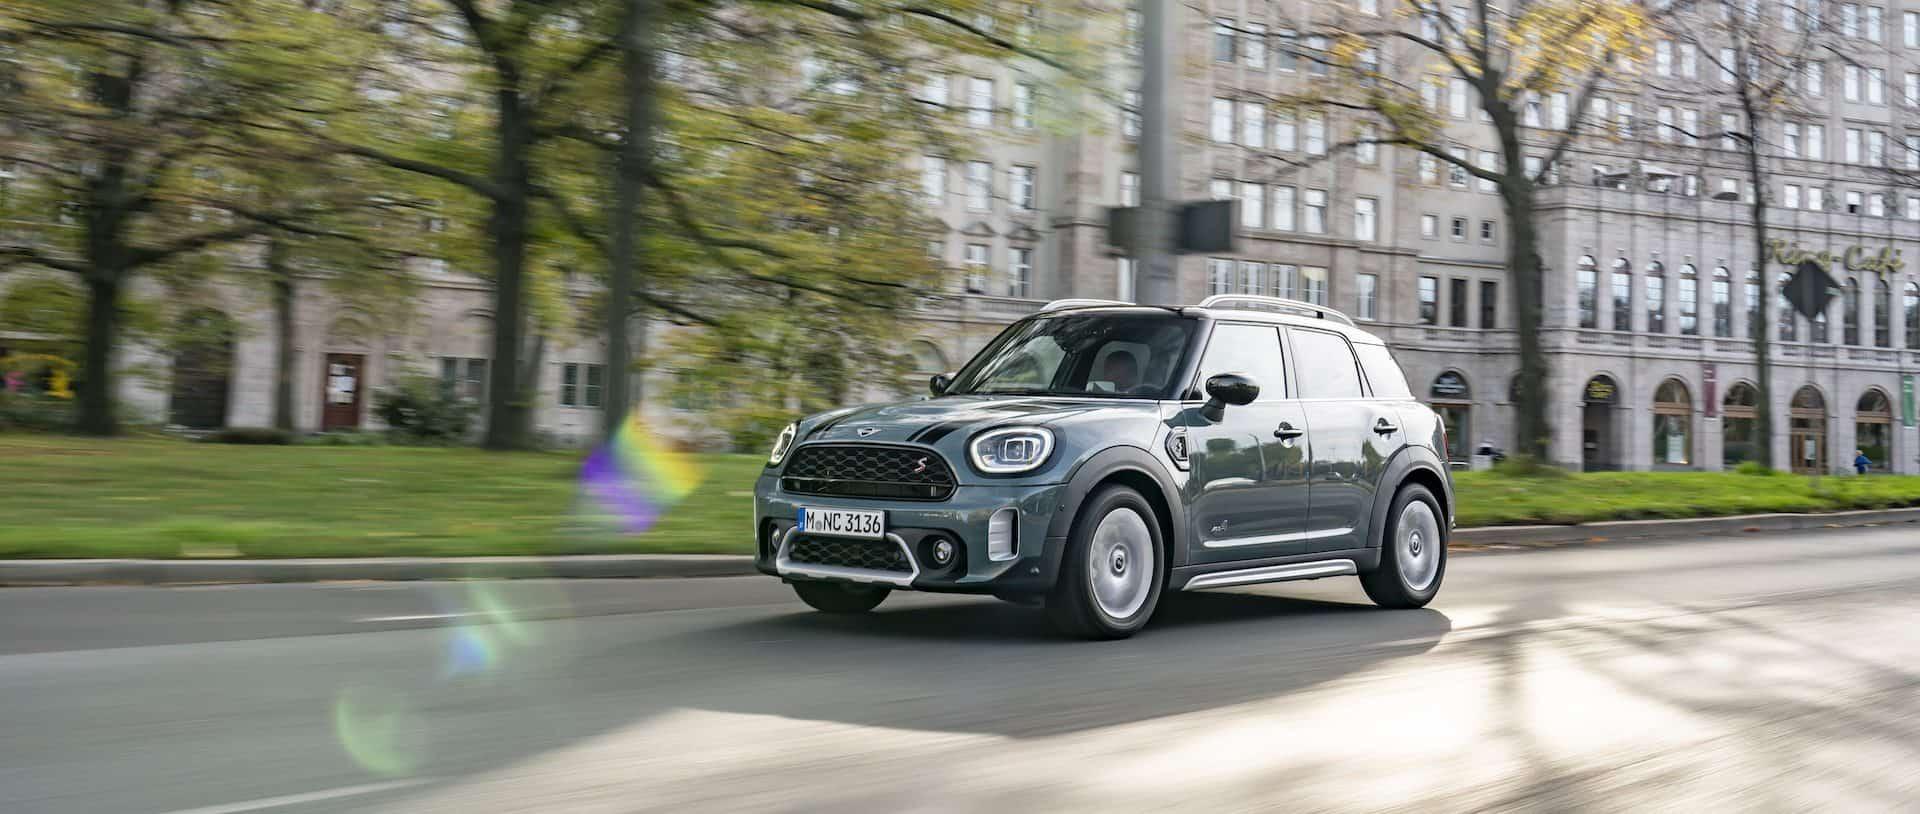 BMW-Mini-Elektroauto-Leipzig-Produktion